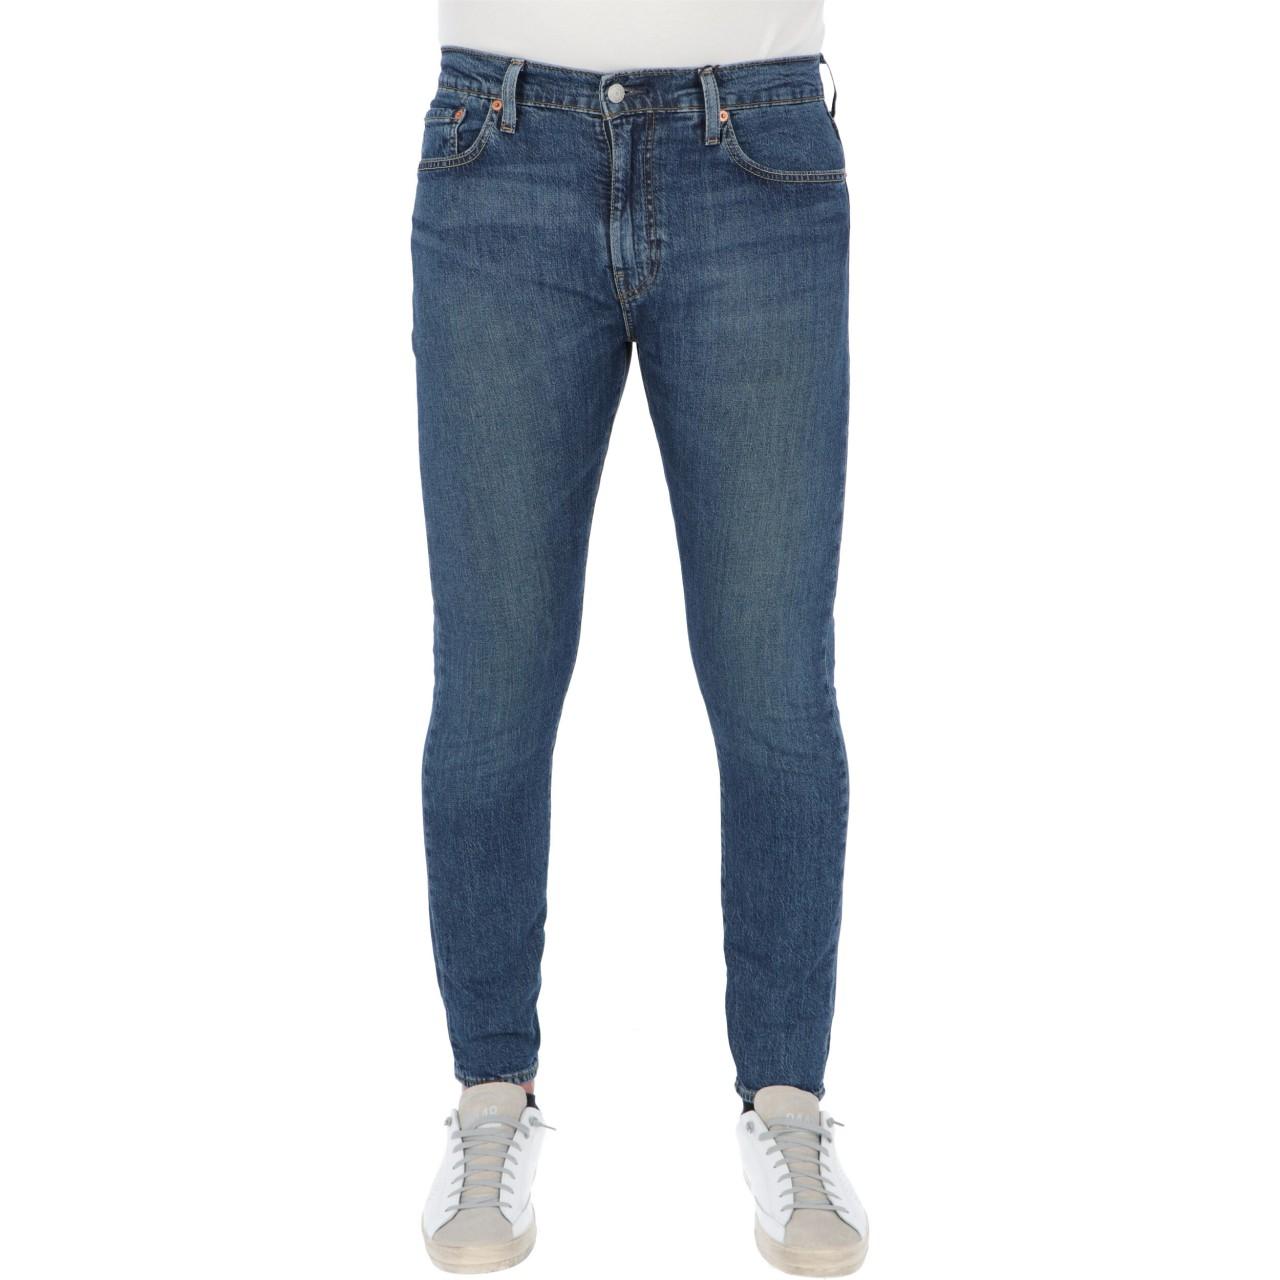 Levi's Uomo Jeans Levi's Uomo 512 Slim Taper Whoop L32 8330850P